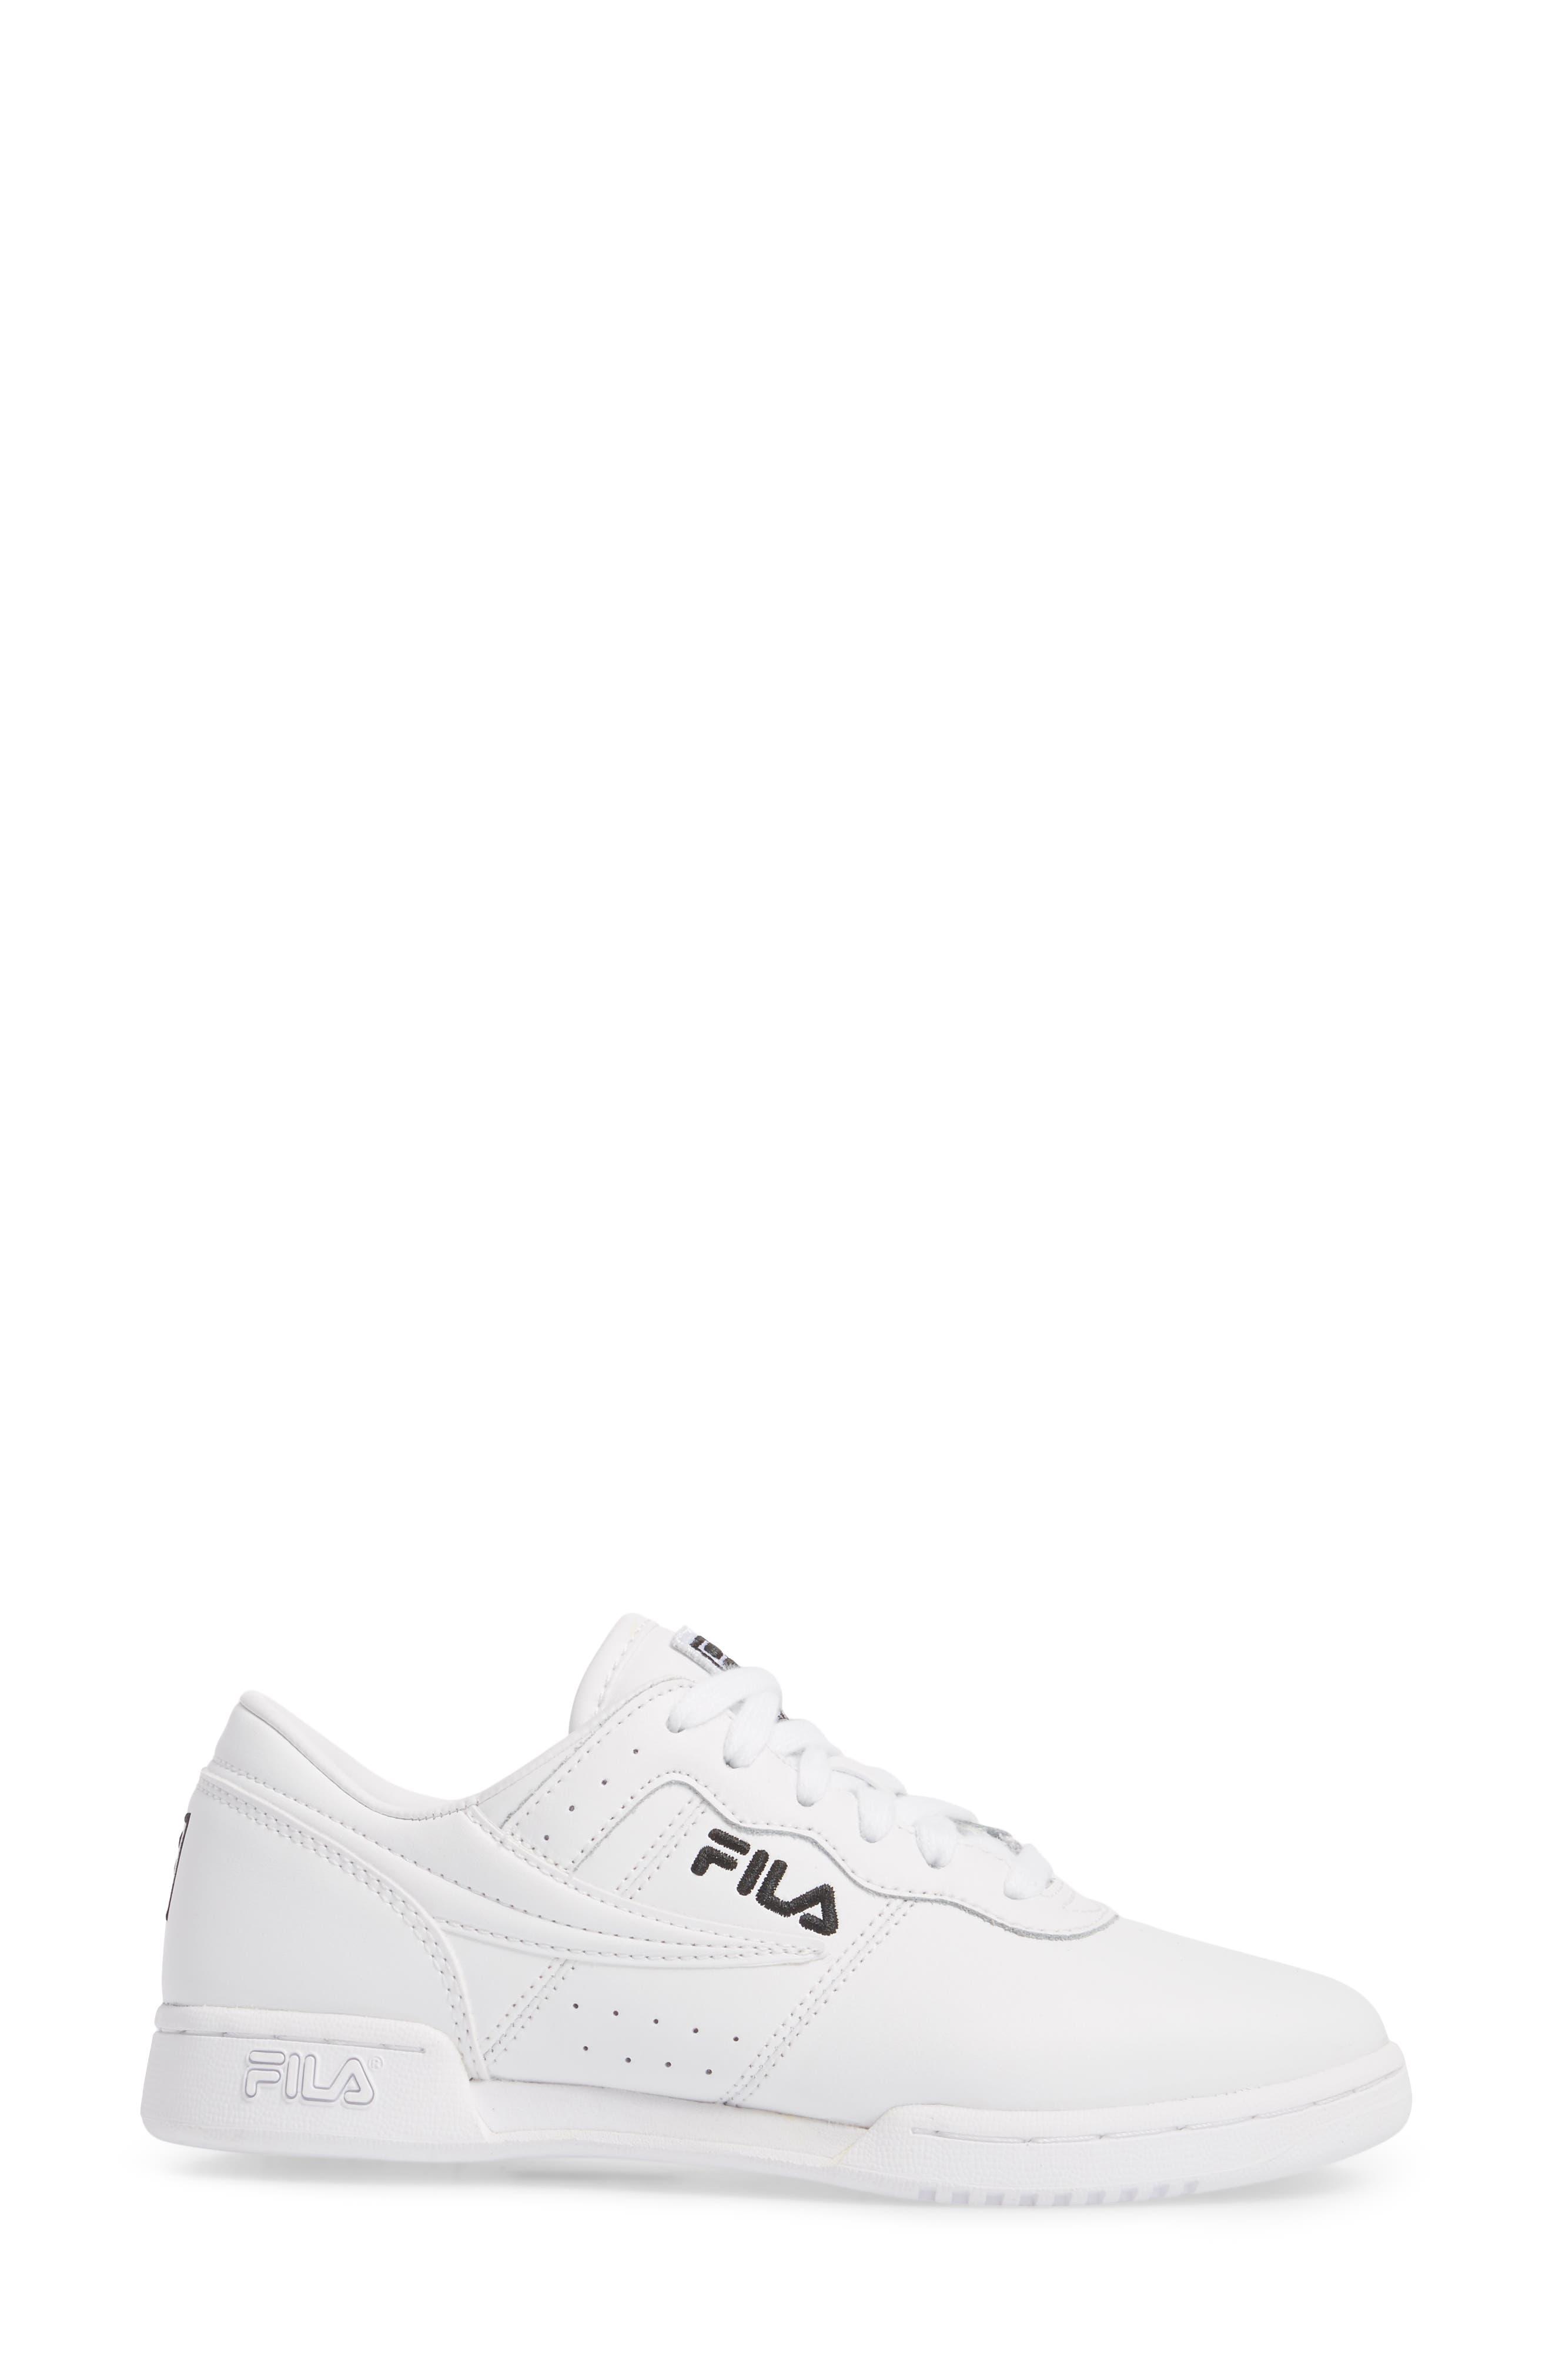 Original Fitness Sneaker,                             Alternate thumbnail 5, color,